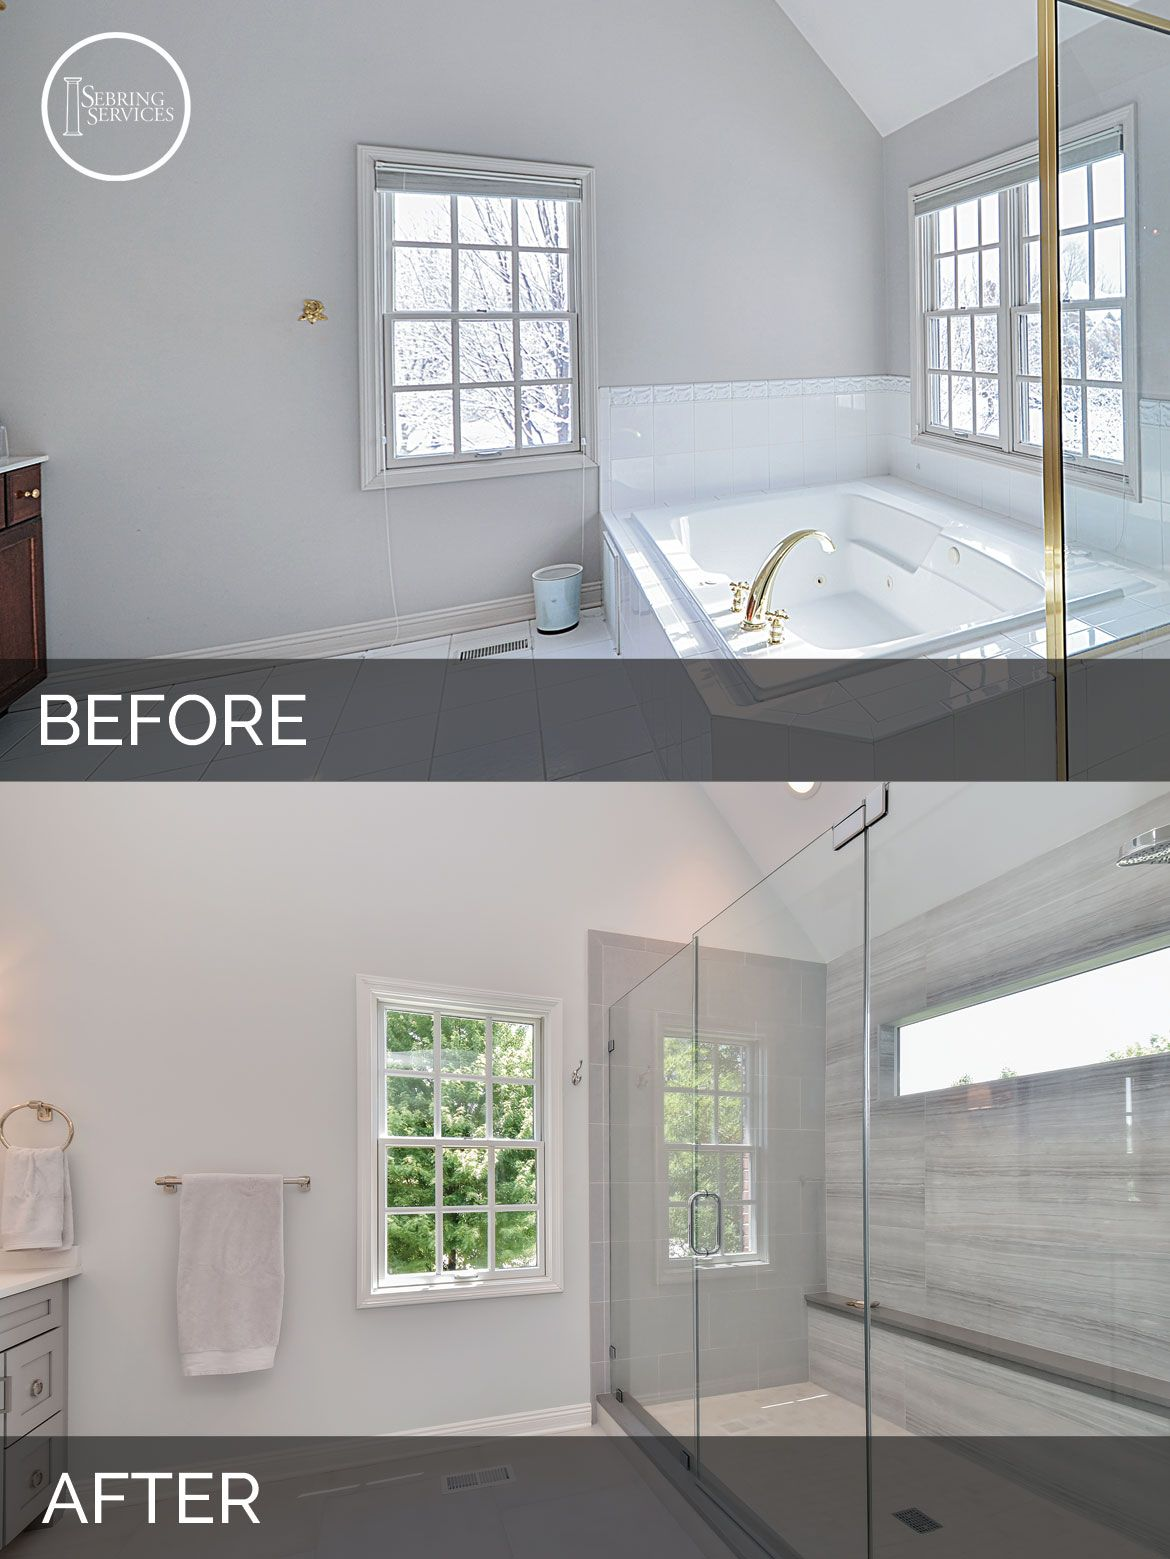 DIY Bathroom Remodel  Before amp After